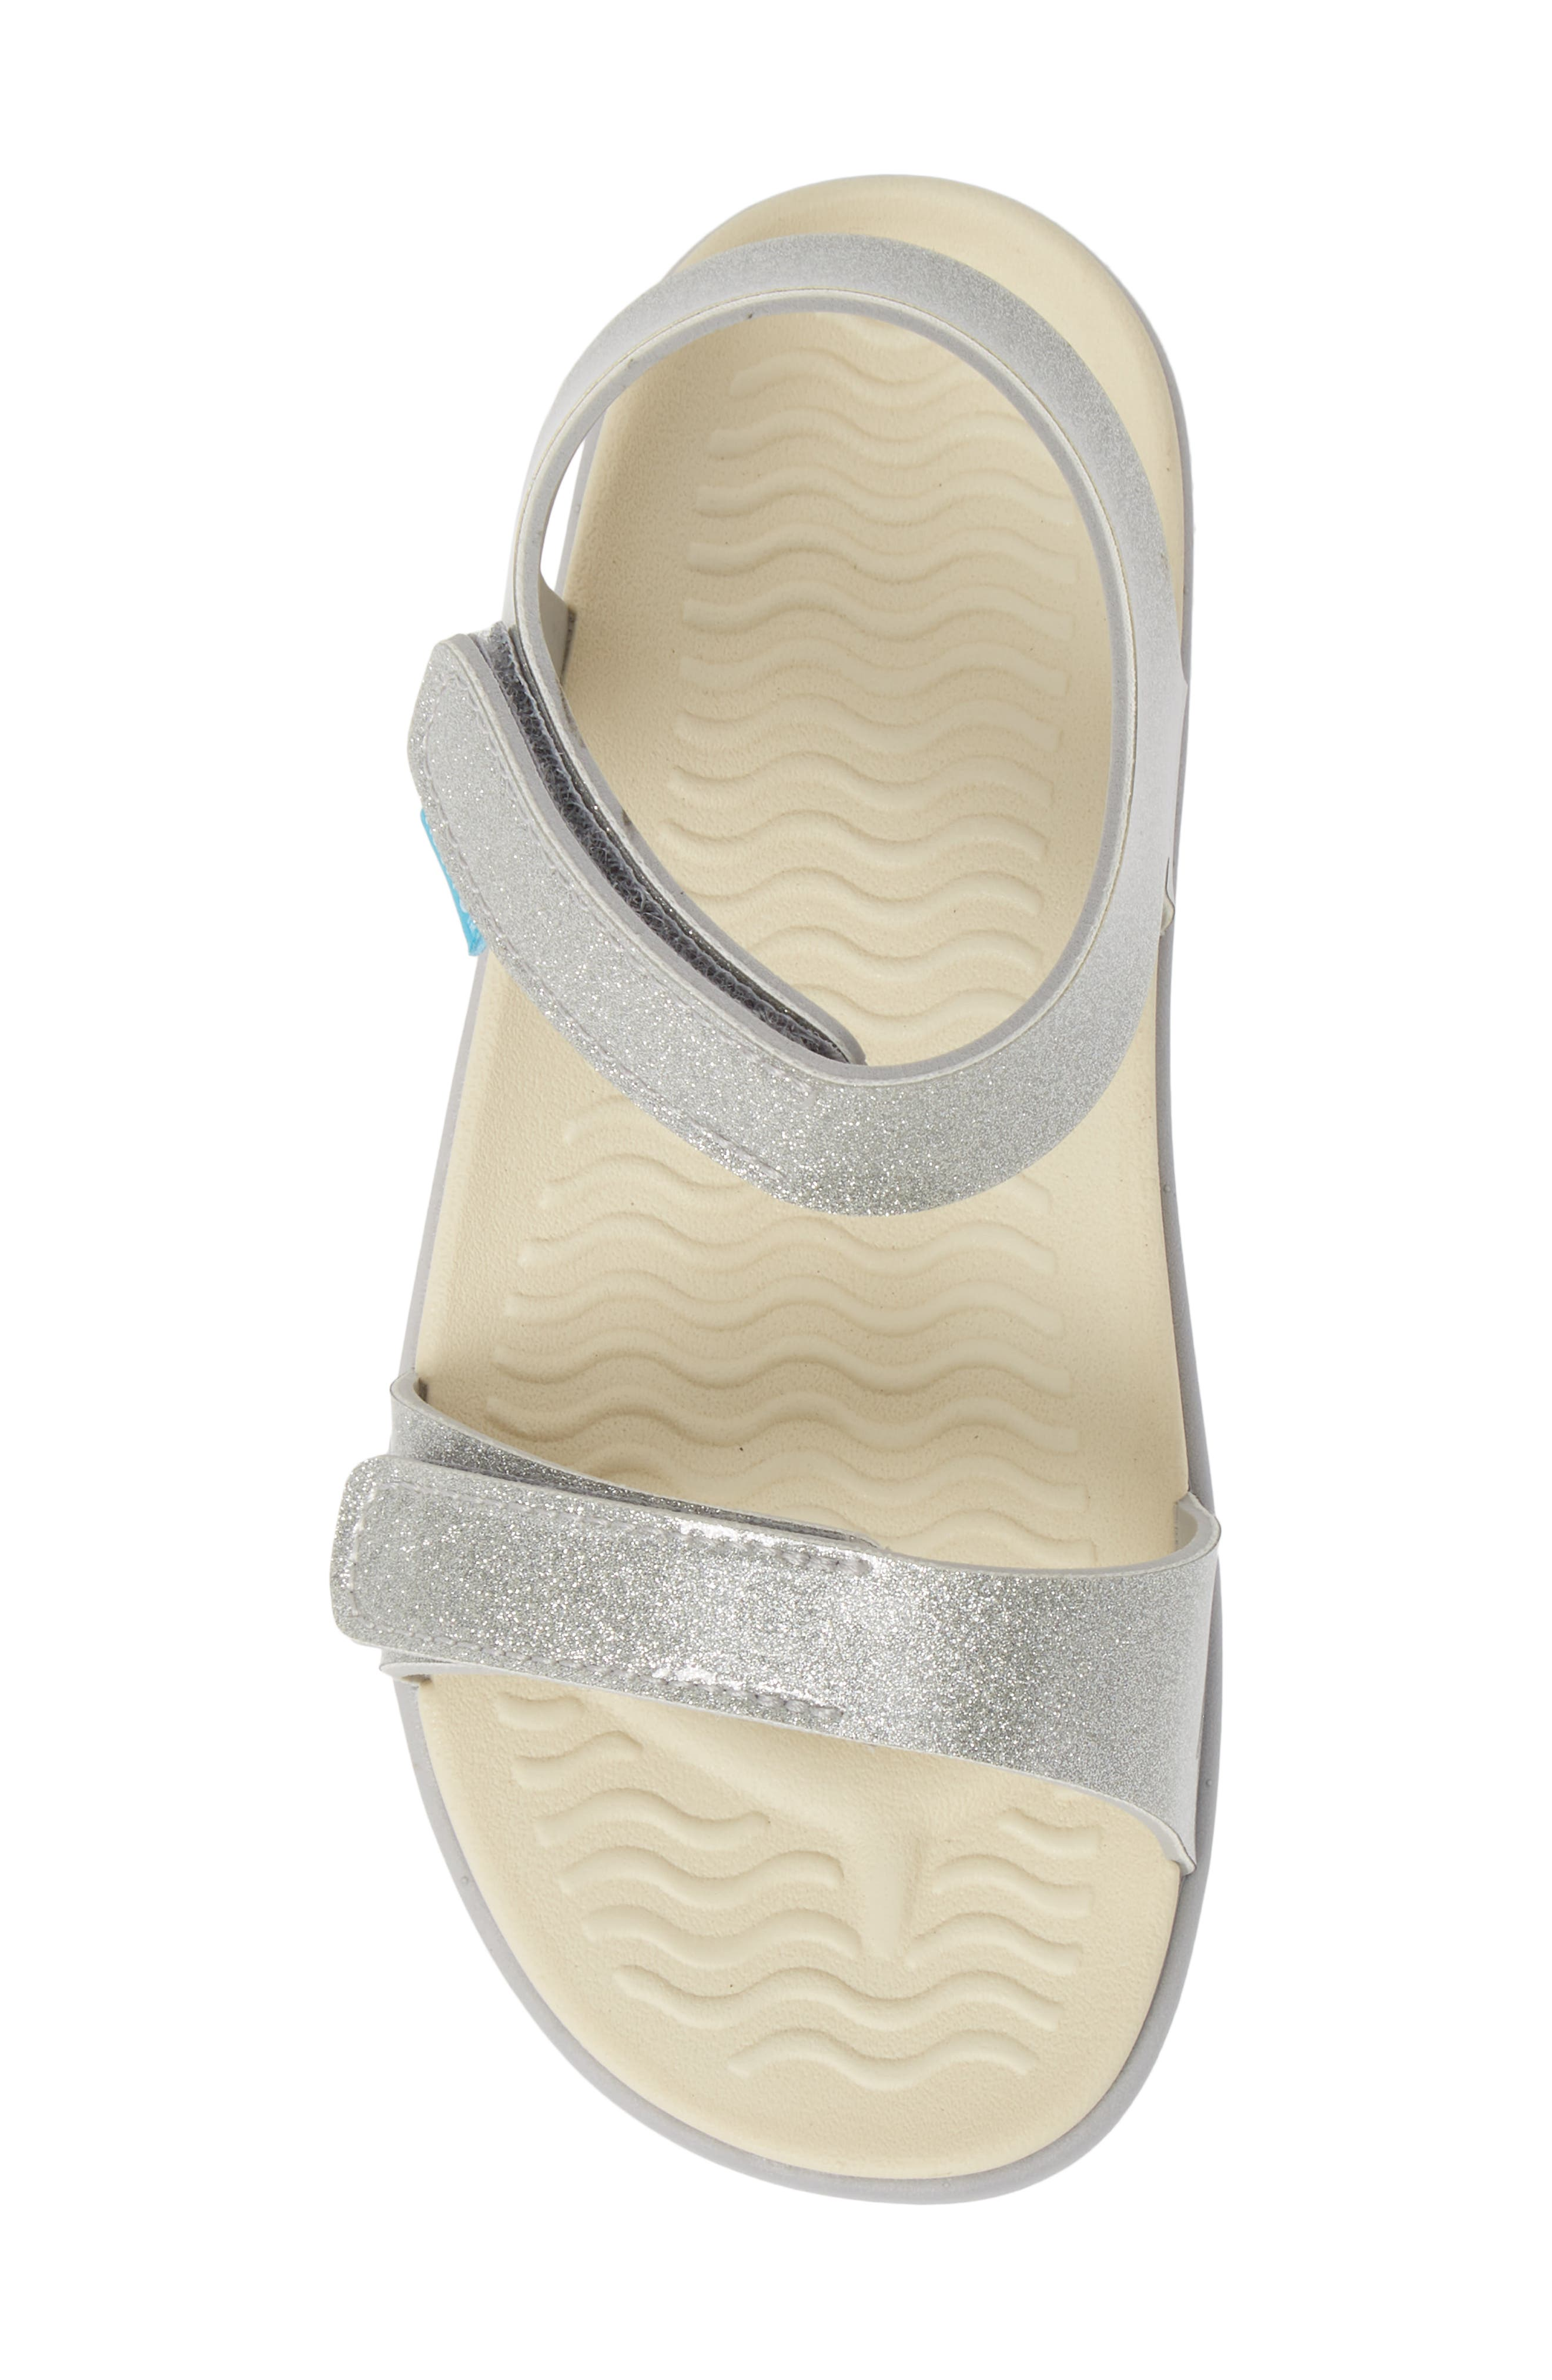 Charley Child Waterproof Flat Vegan Sandal,                             Alternate thumbnail 5, color,                             SILVER GLITTER/ WHITE/ GREY